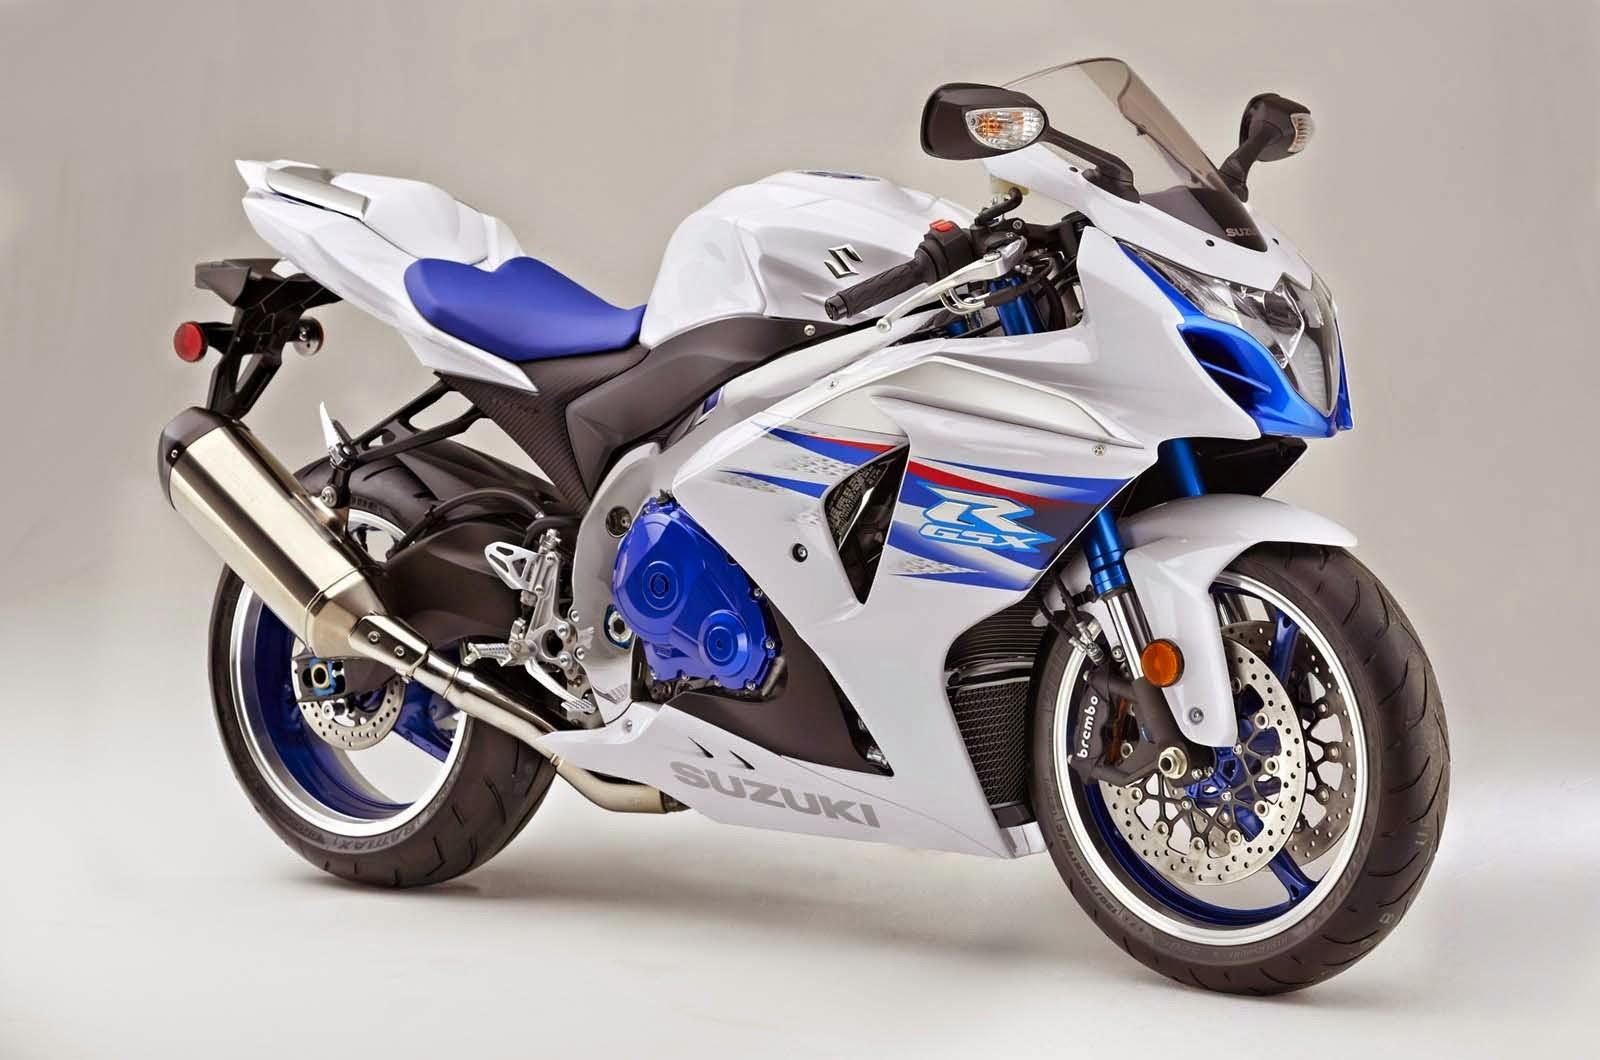 Harga Motor Suzuki Gsxr 600  impremedianet